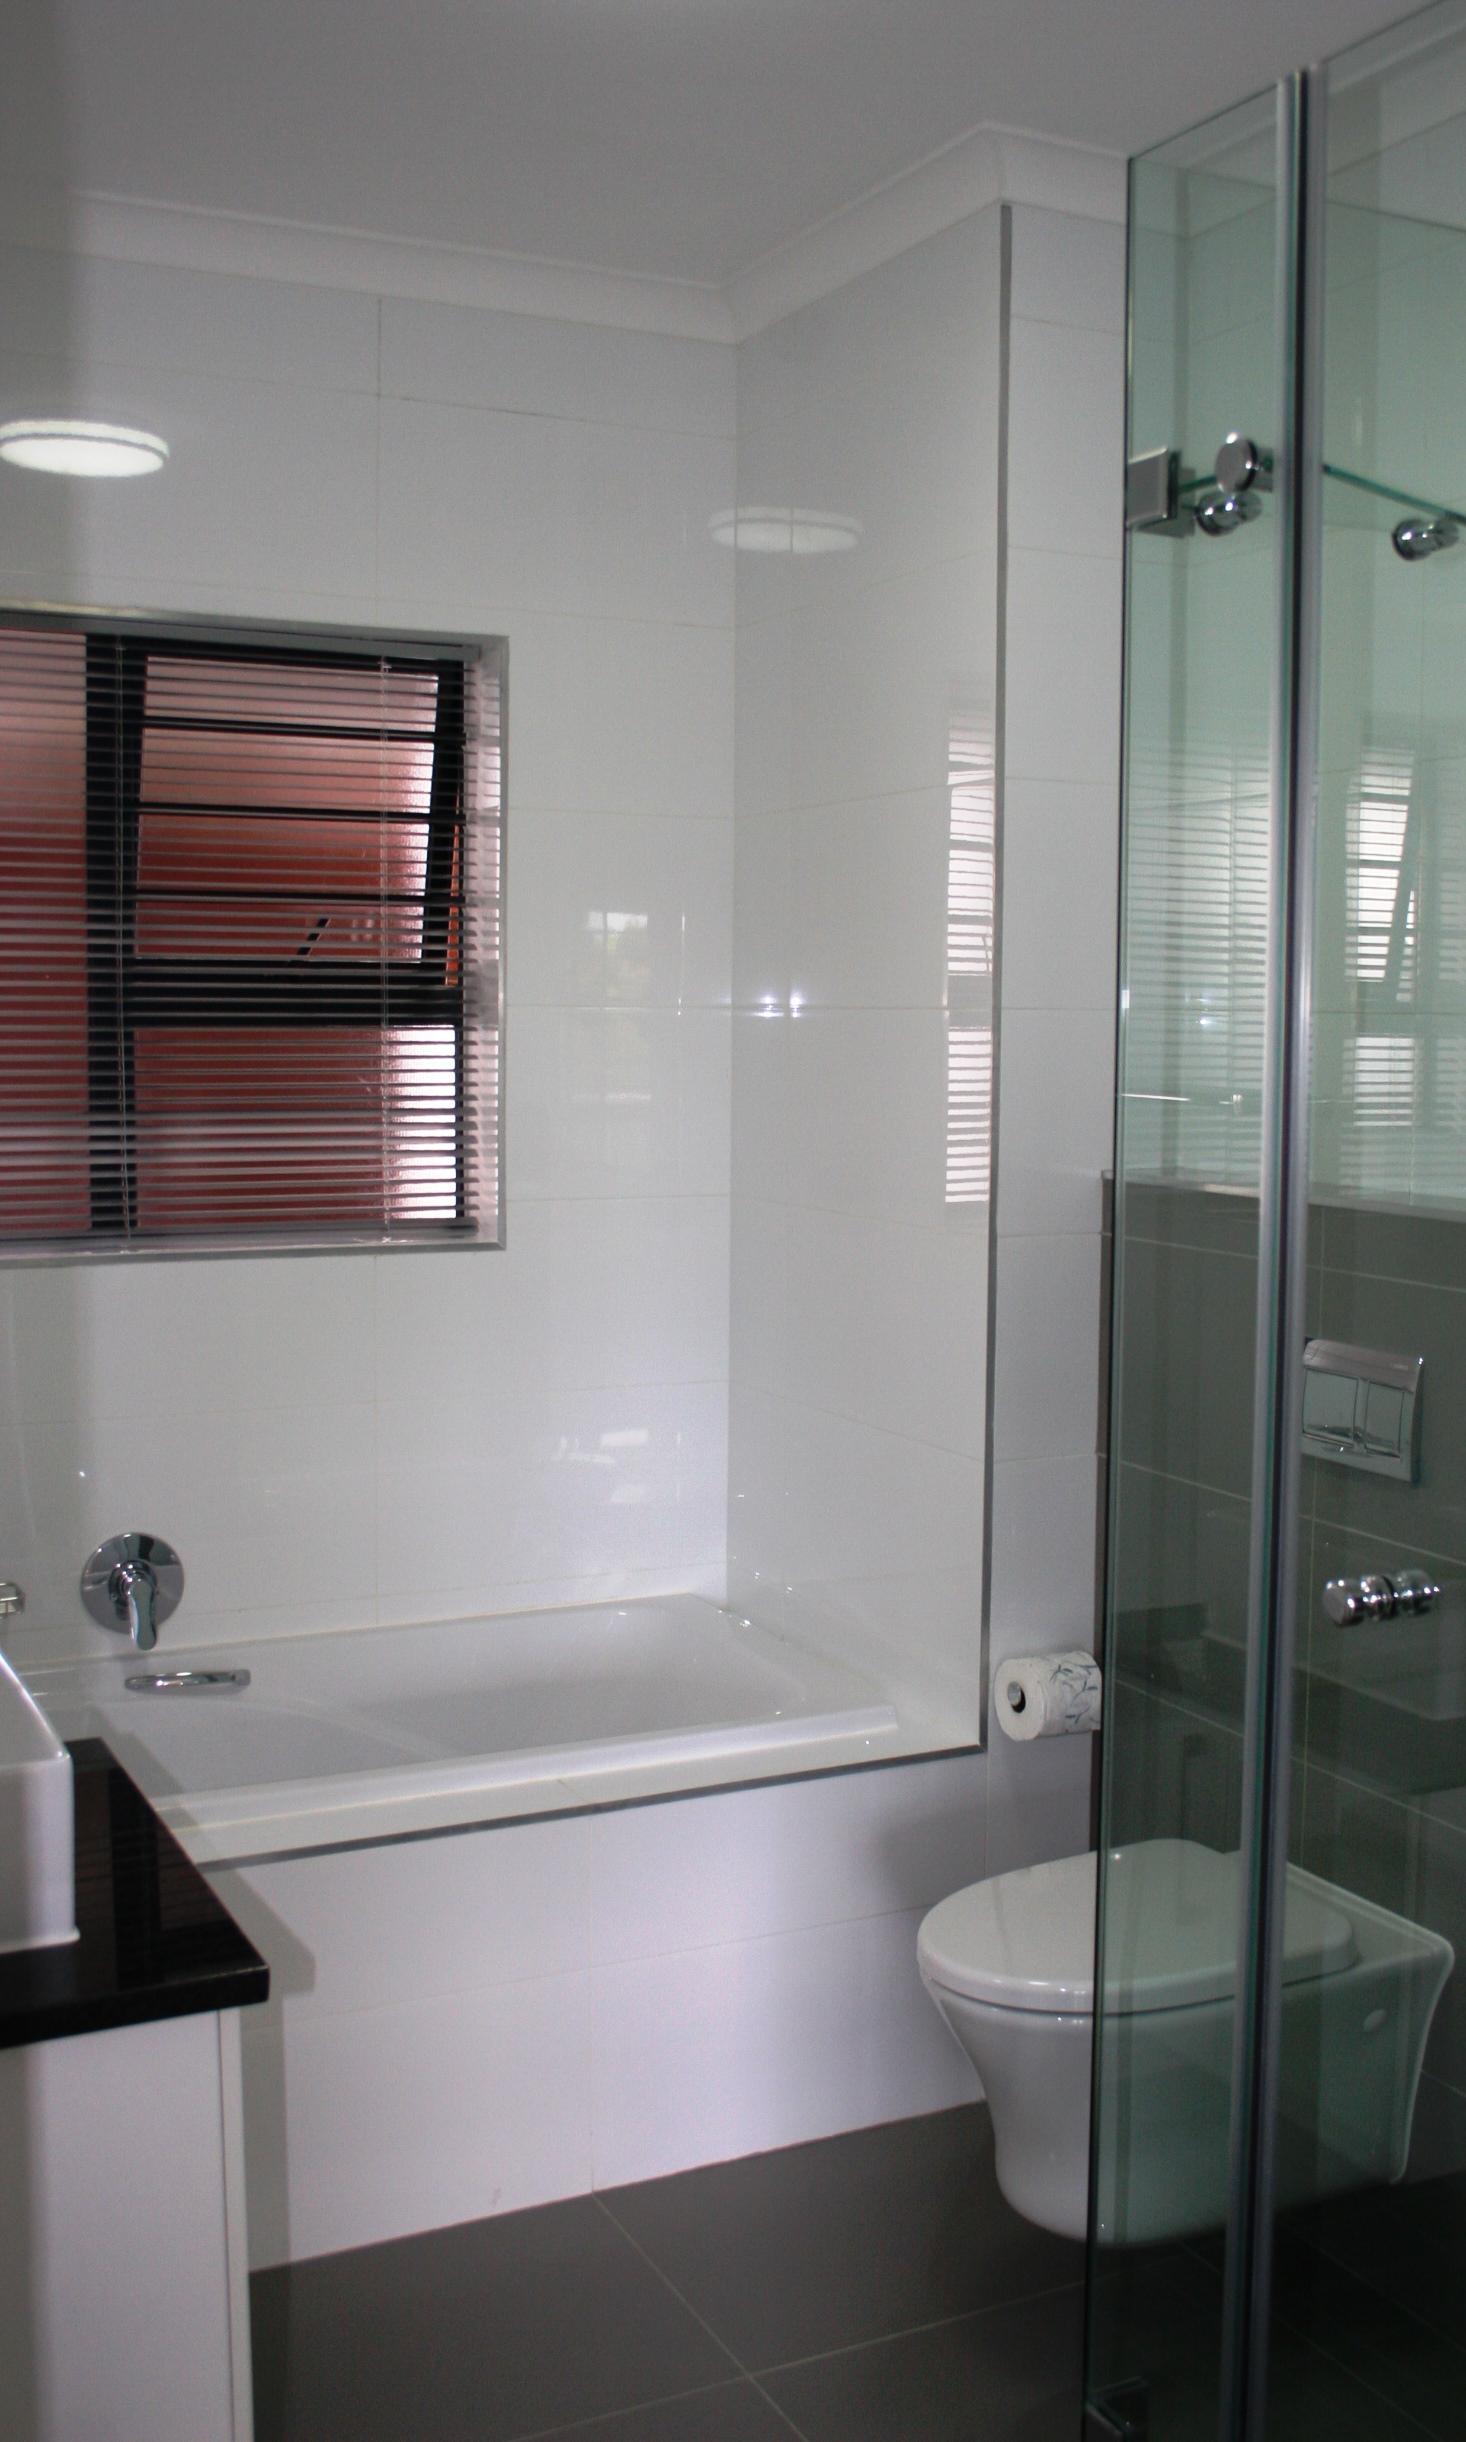 Apartments, Festival Court, Rondebosch, Kwali Mark Construction